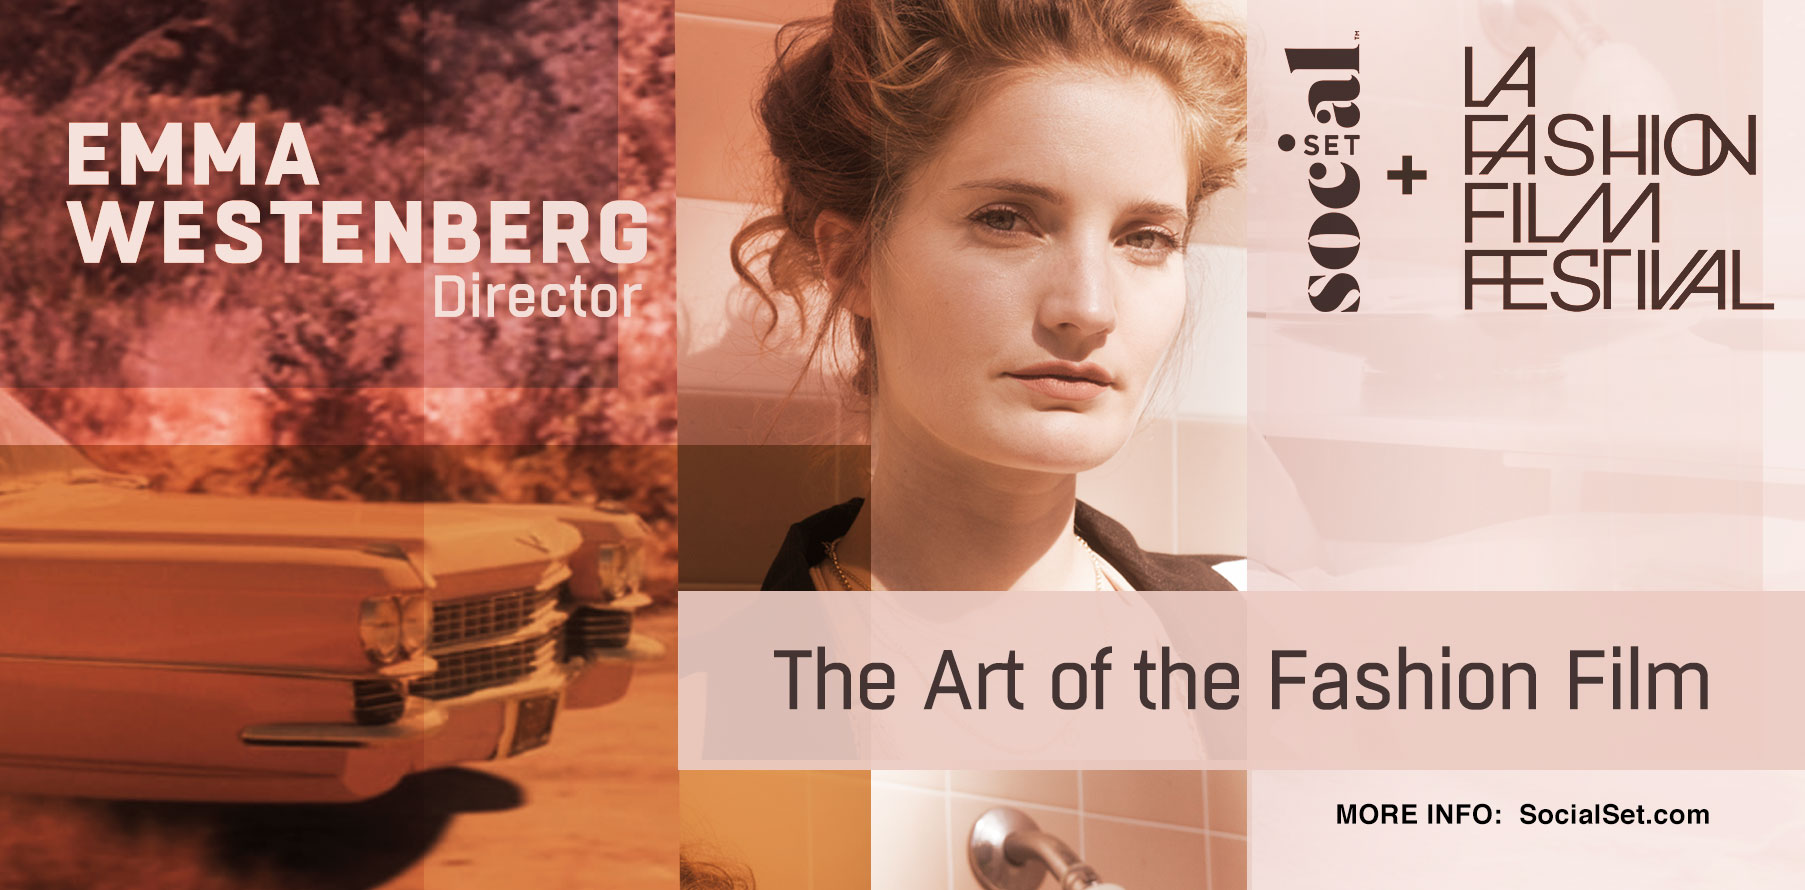 The-Art-Of-The-Fashion-Film-Emma-Westenberg-3.jpg